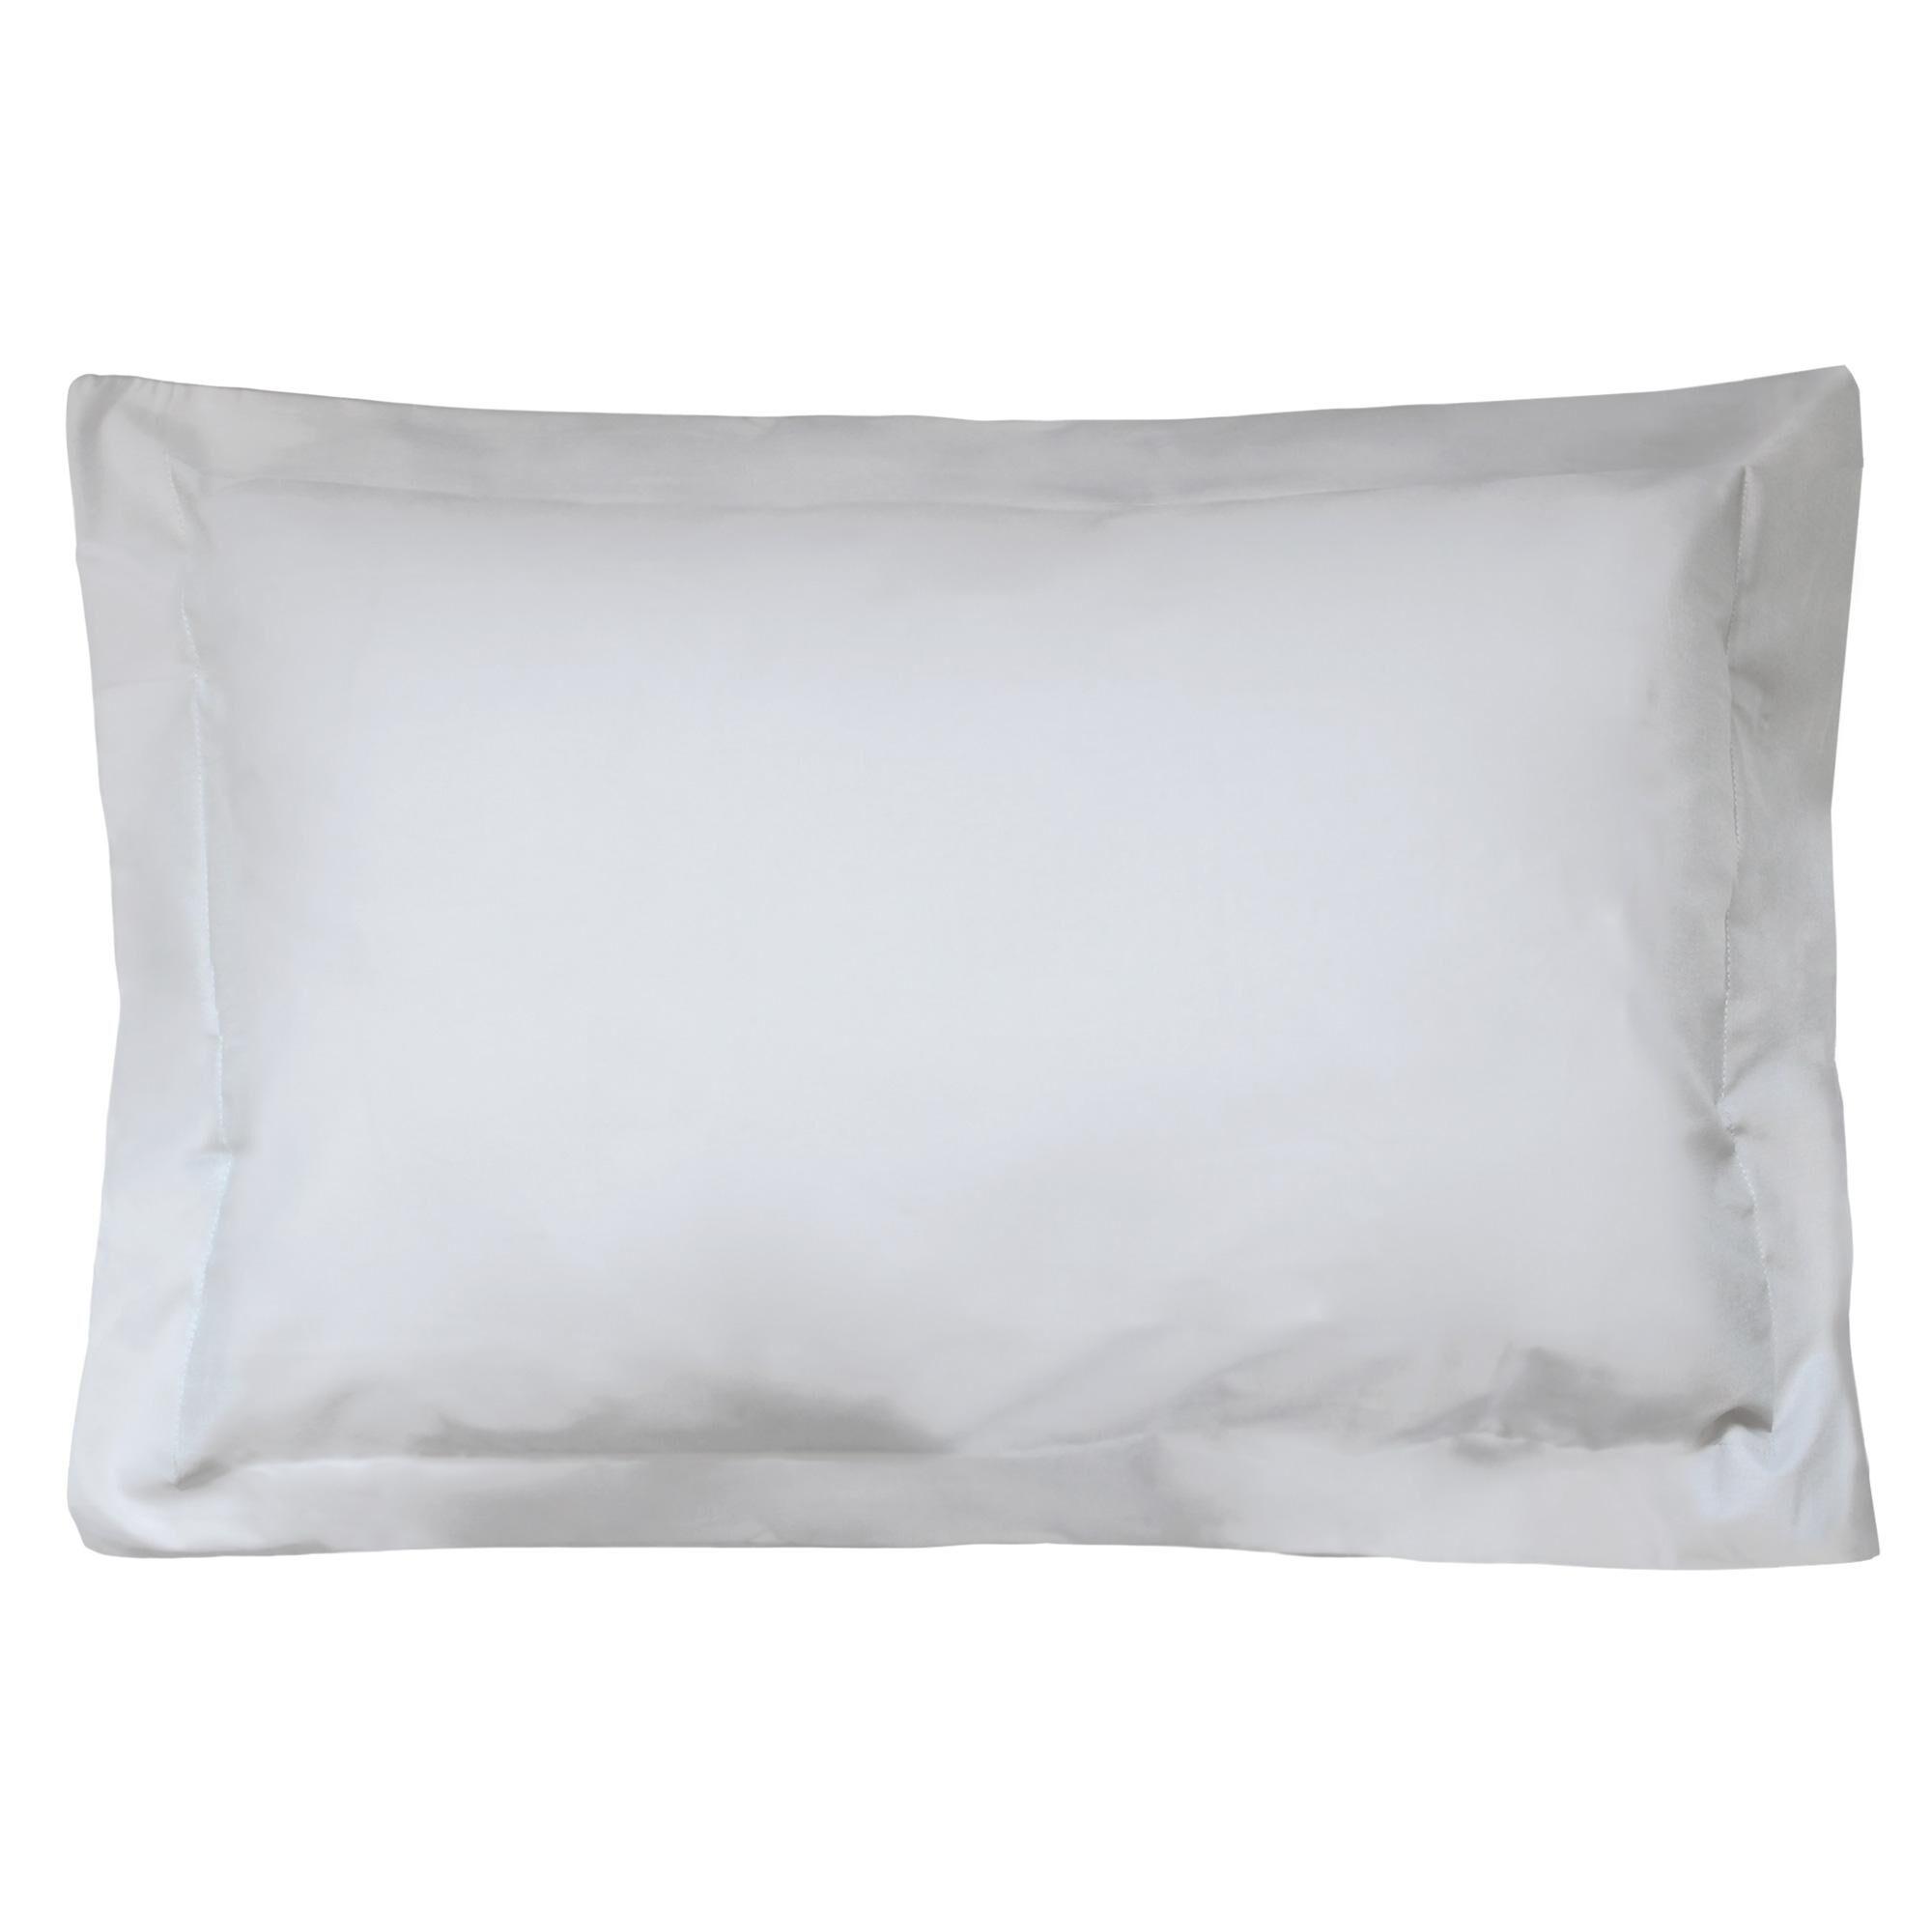 Linnea Taie d'oreiller uni 80x50 cm 100% coton ALTO Calcium